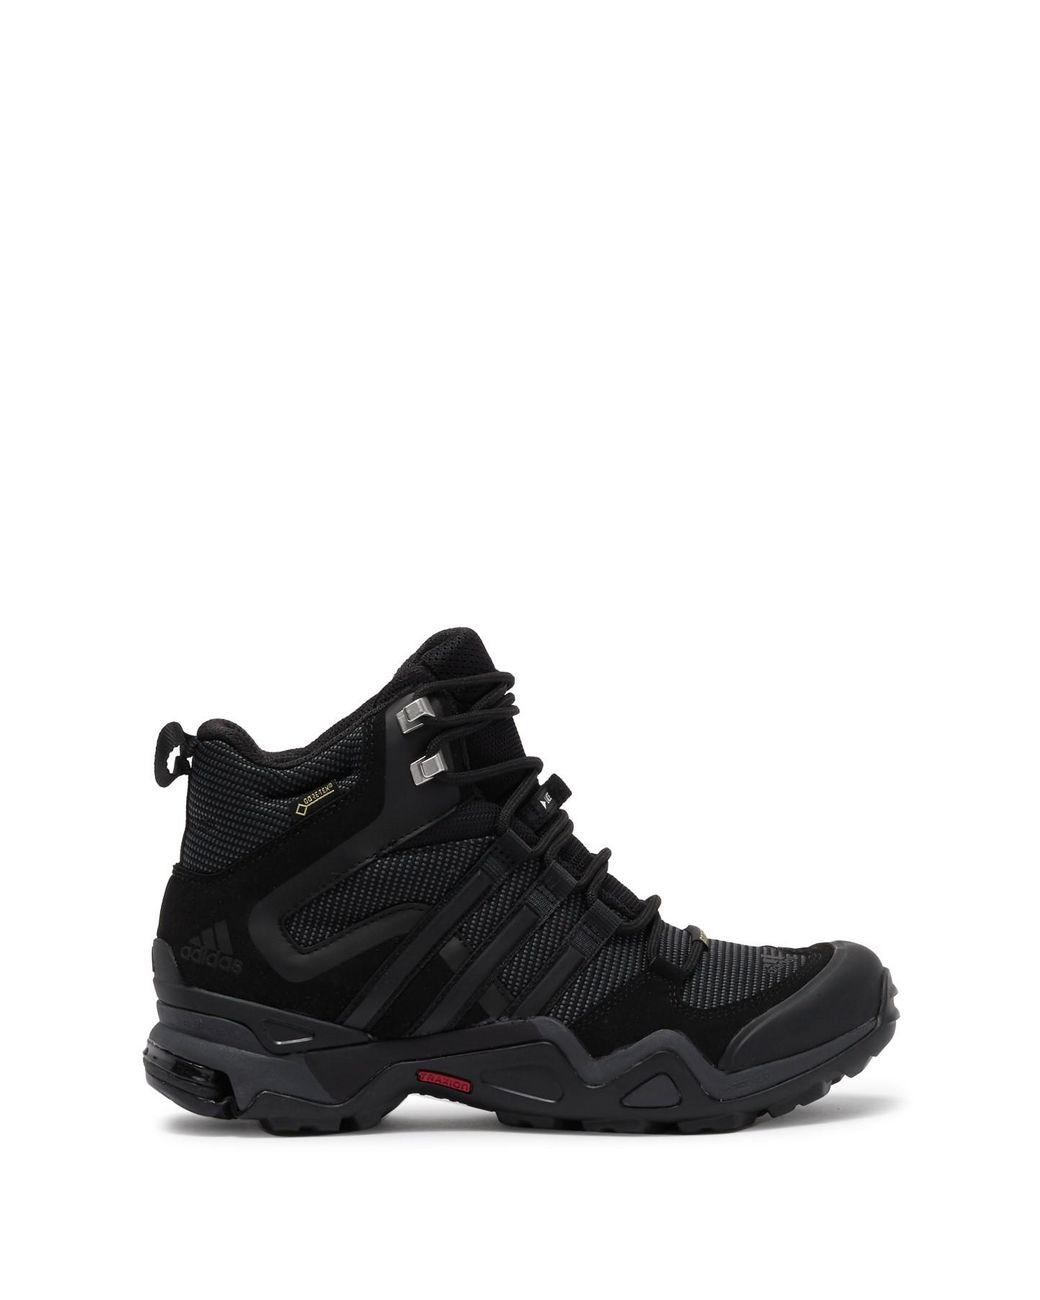 adidas fast x high gtx shoes